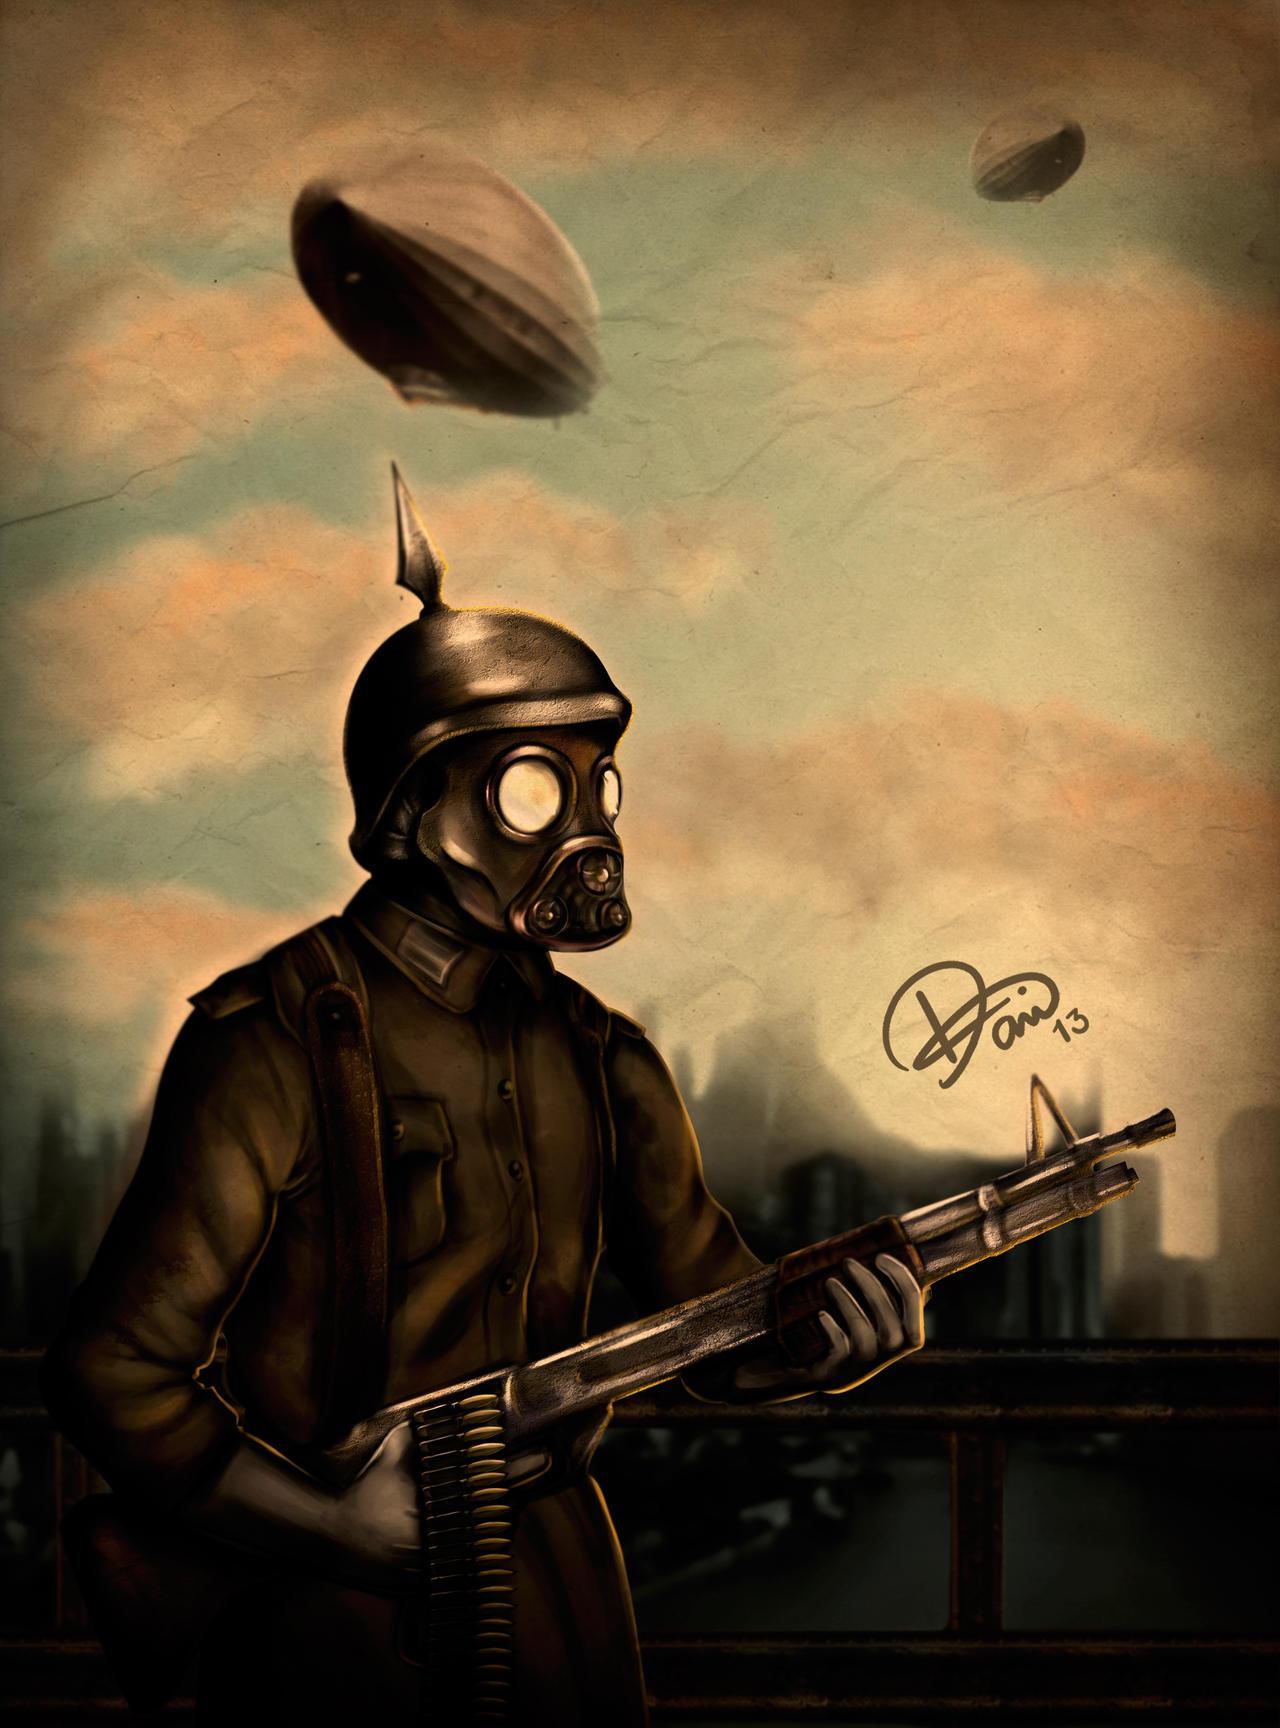 Dieselpunk Soldier DieselPunk - Soldier by